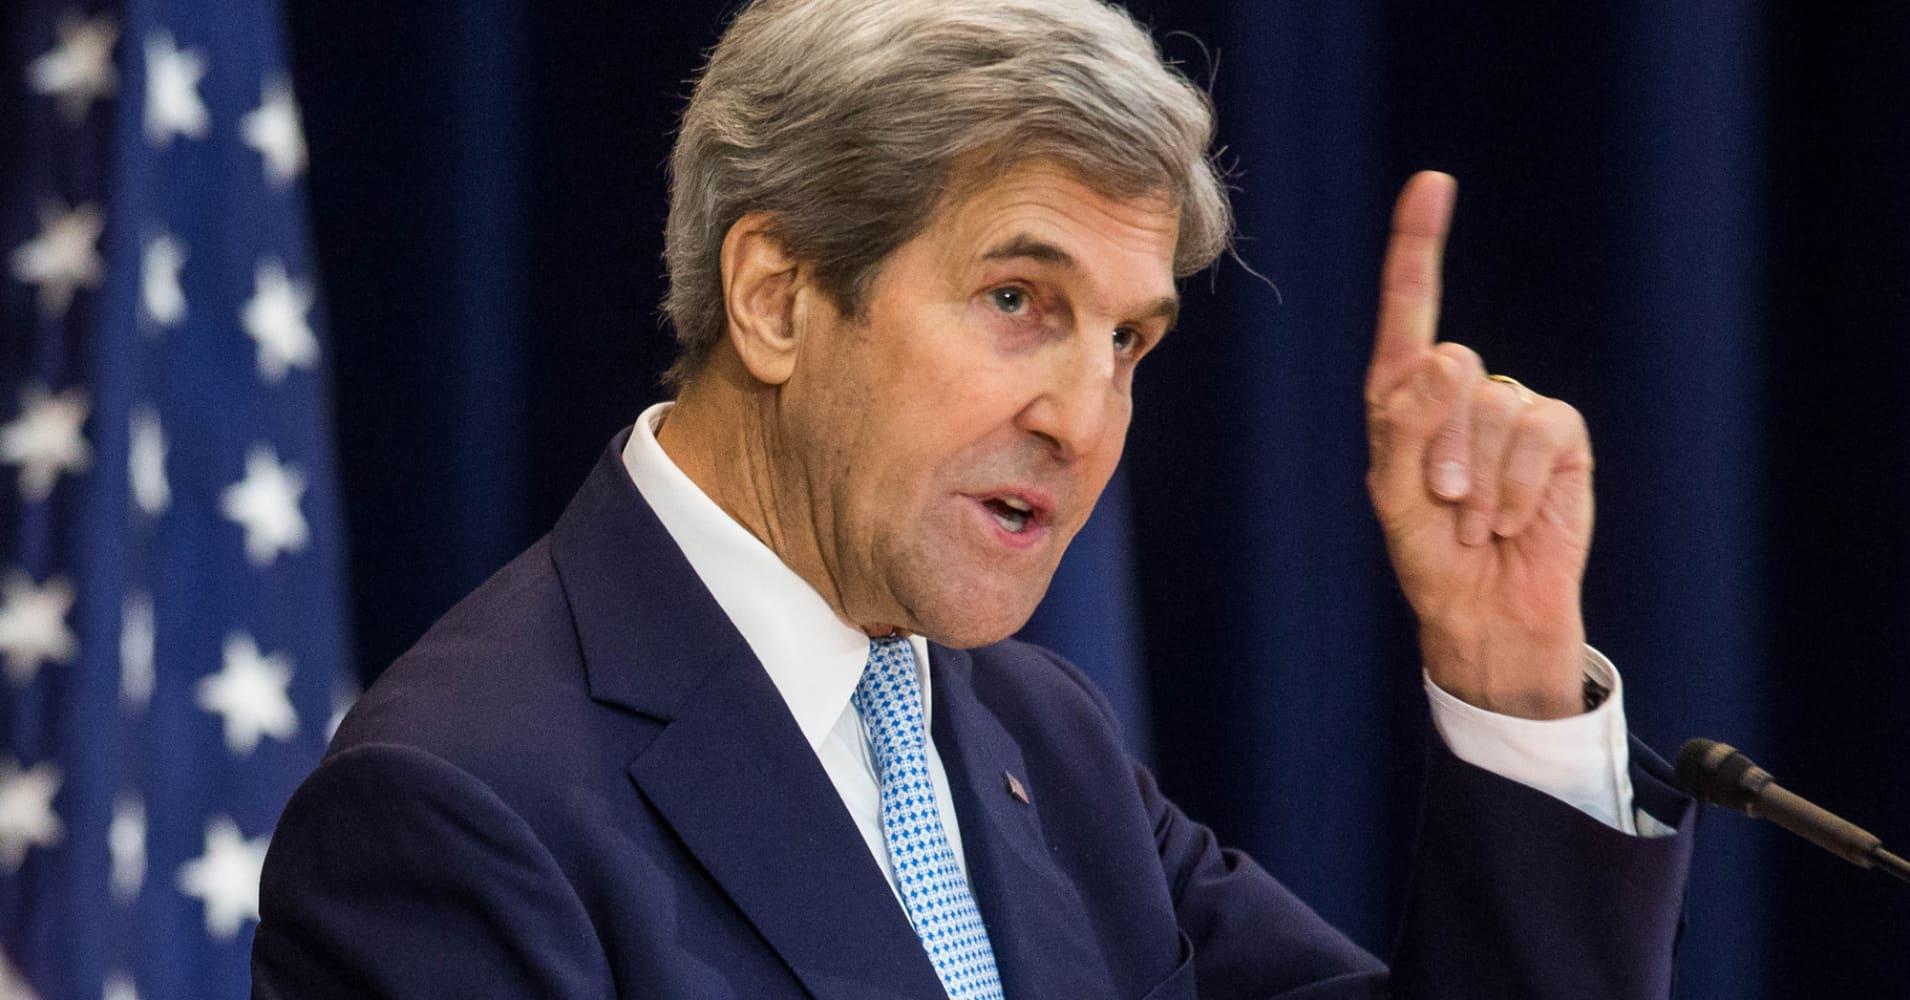 John Kerry: President Donald Trump should resign